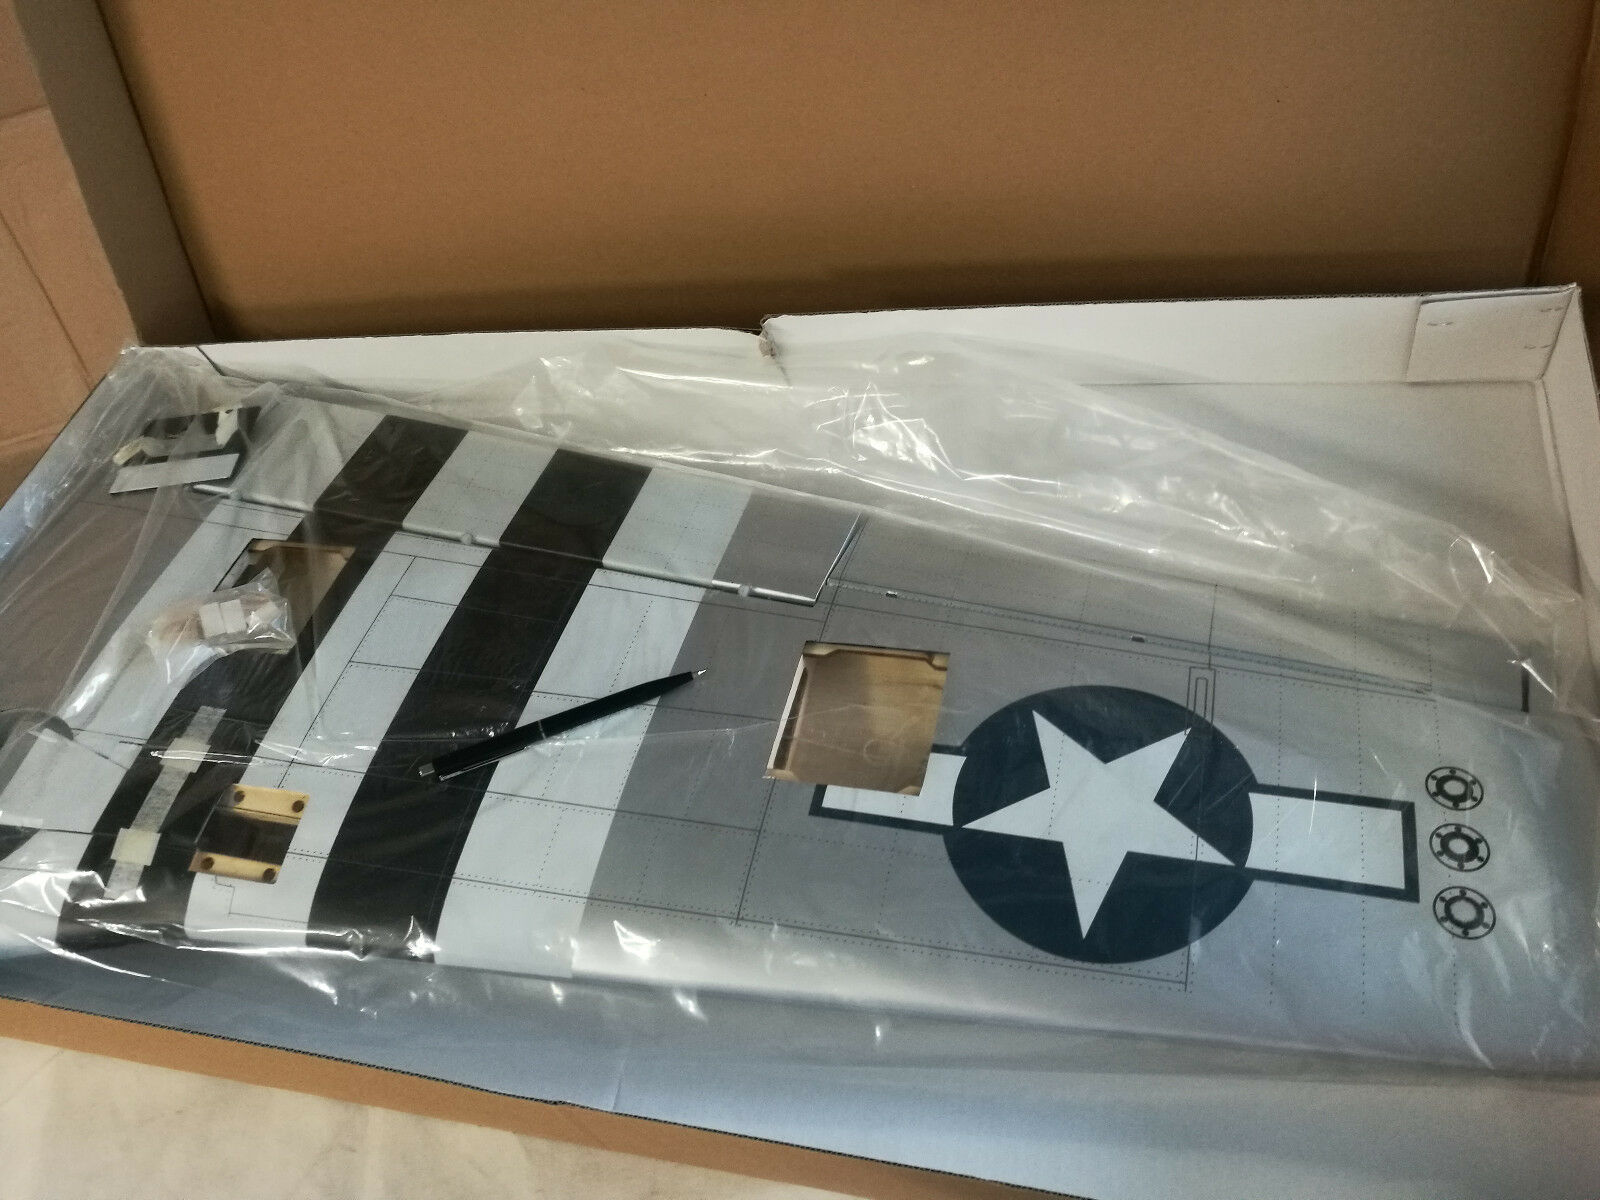 HANGAR 9  HAN24204  AILE  DROITE  DE  P-51  60ARF  blueE  NOSE